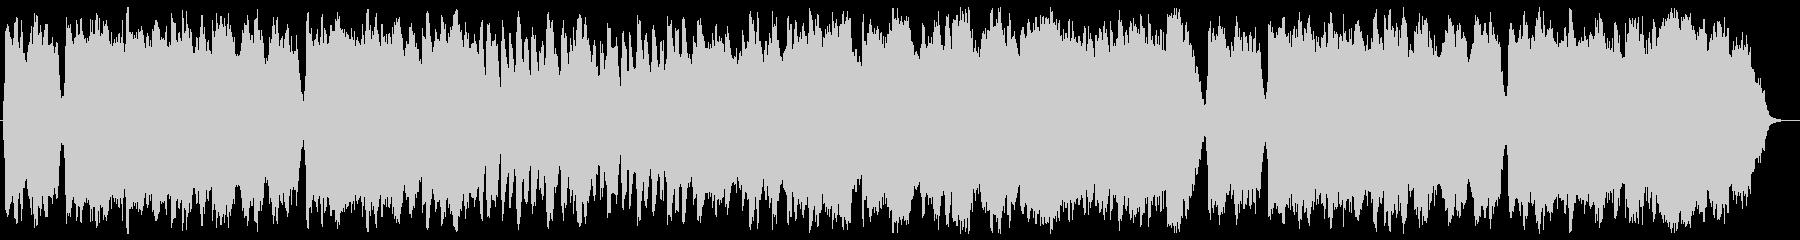 Wedding Chorus (Wagner)'s unreproduced waveform